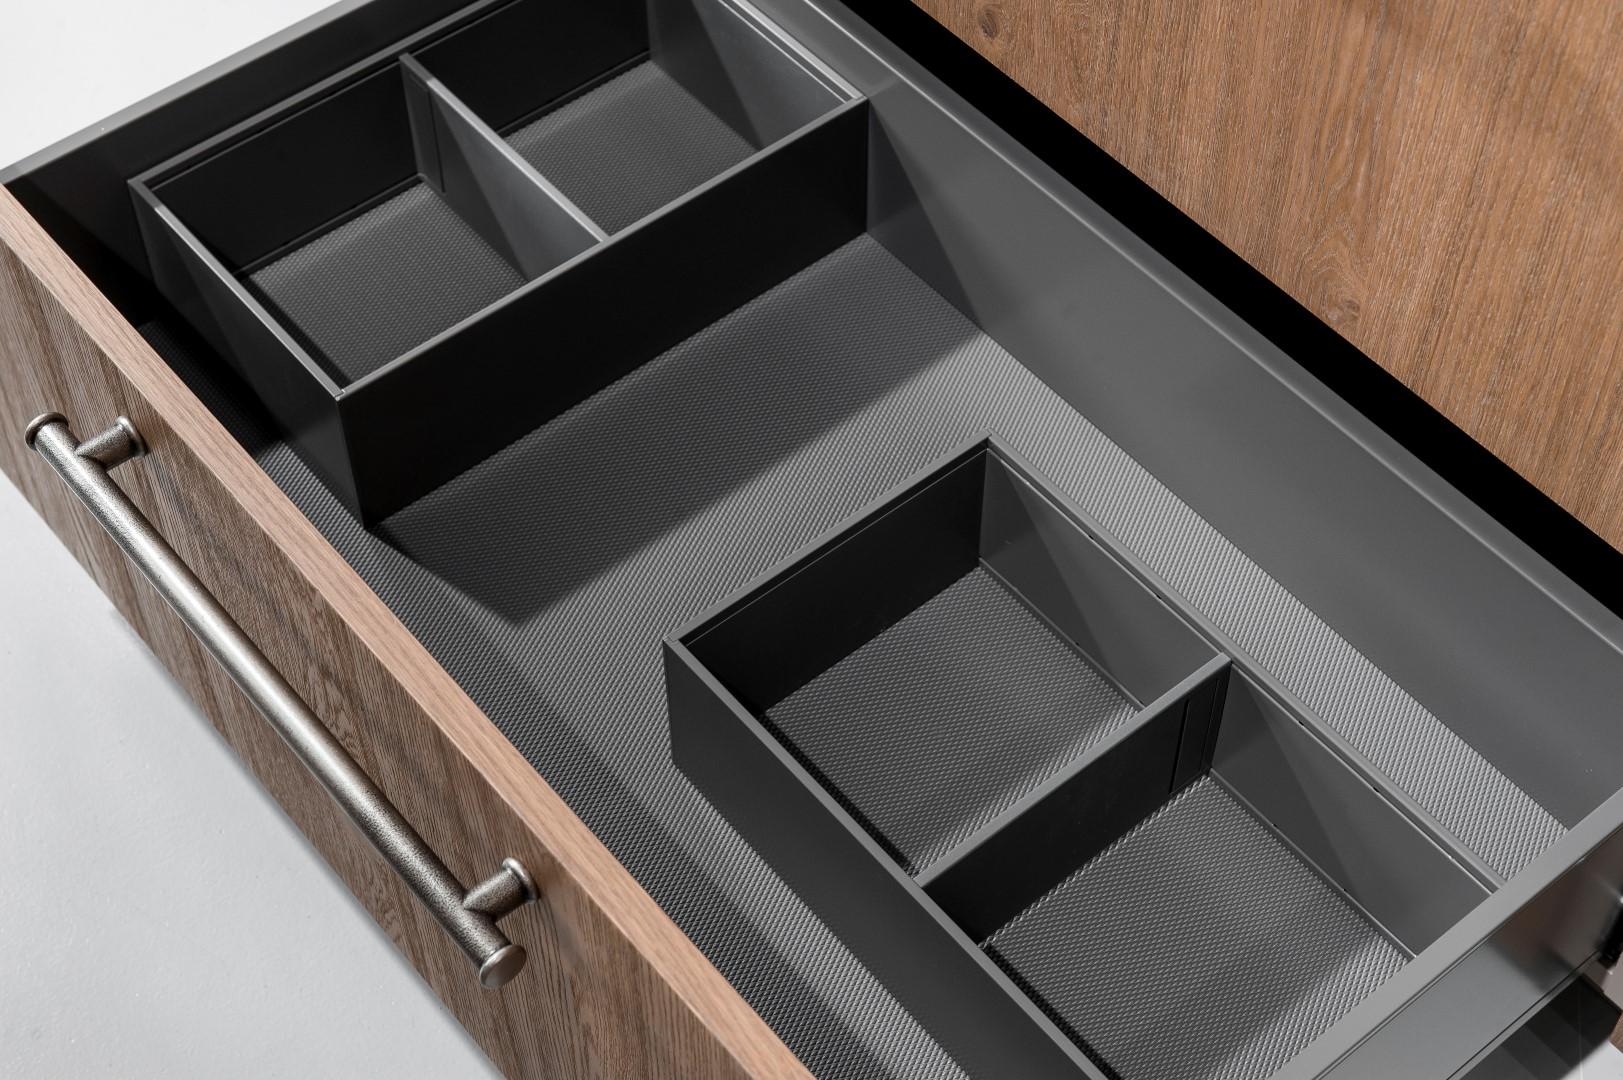 Keuken inspiratie modern klassiek apparaten keukenatelier brands milsbeek - Moderne apparaten ...